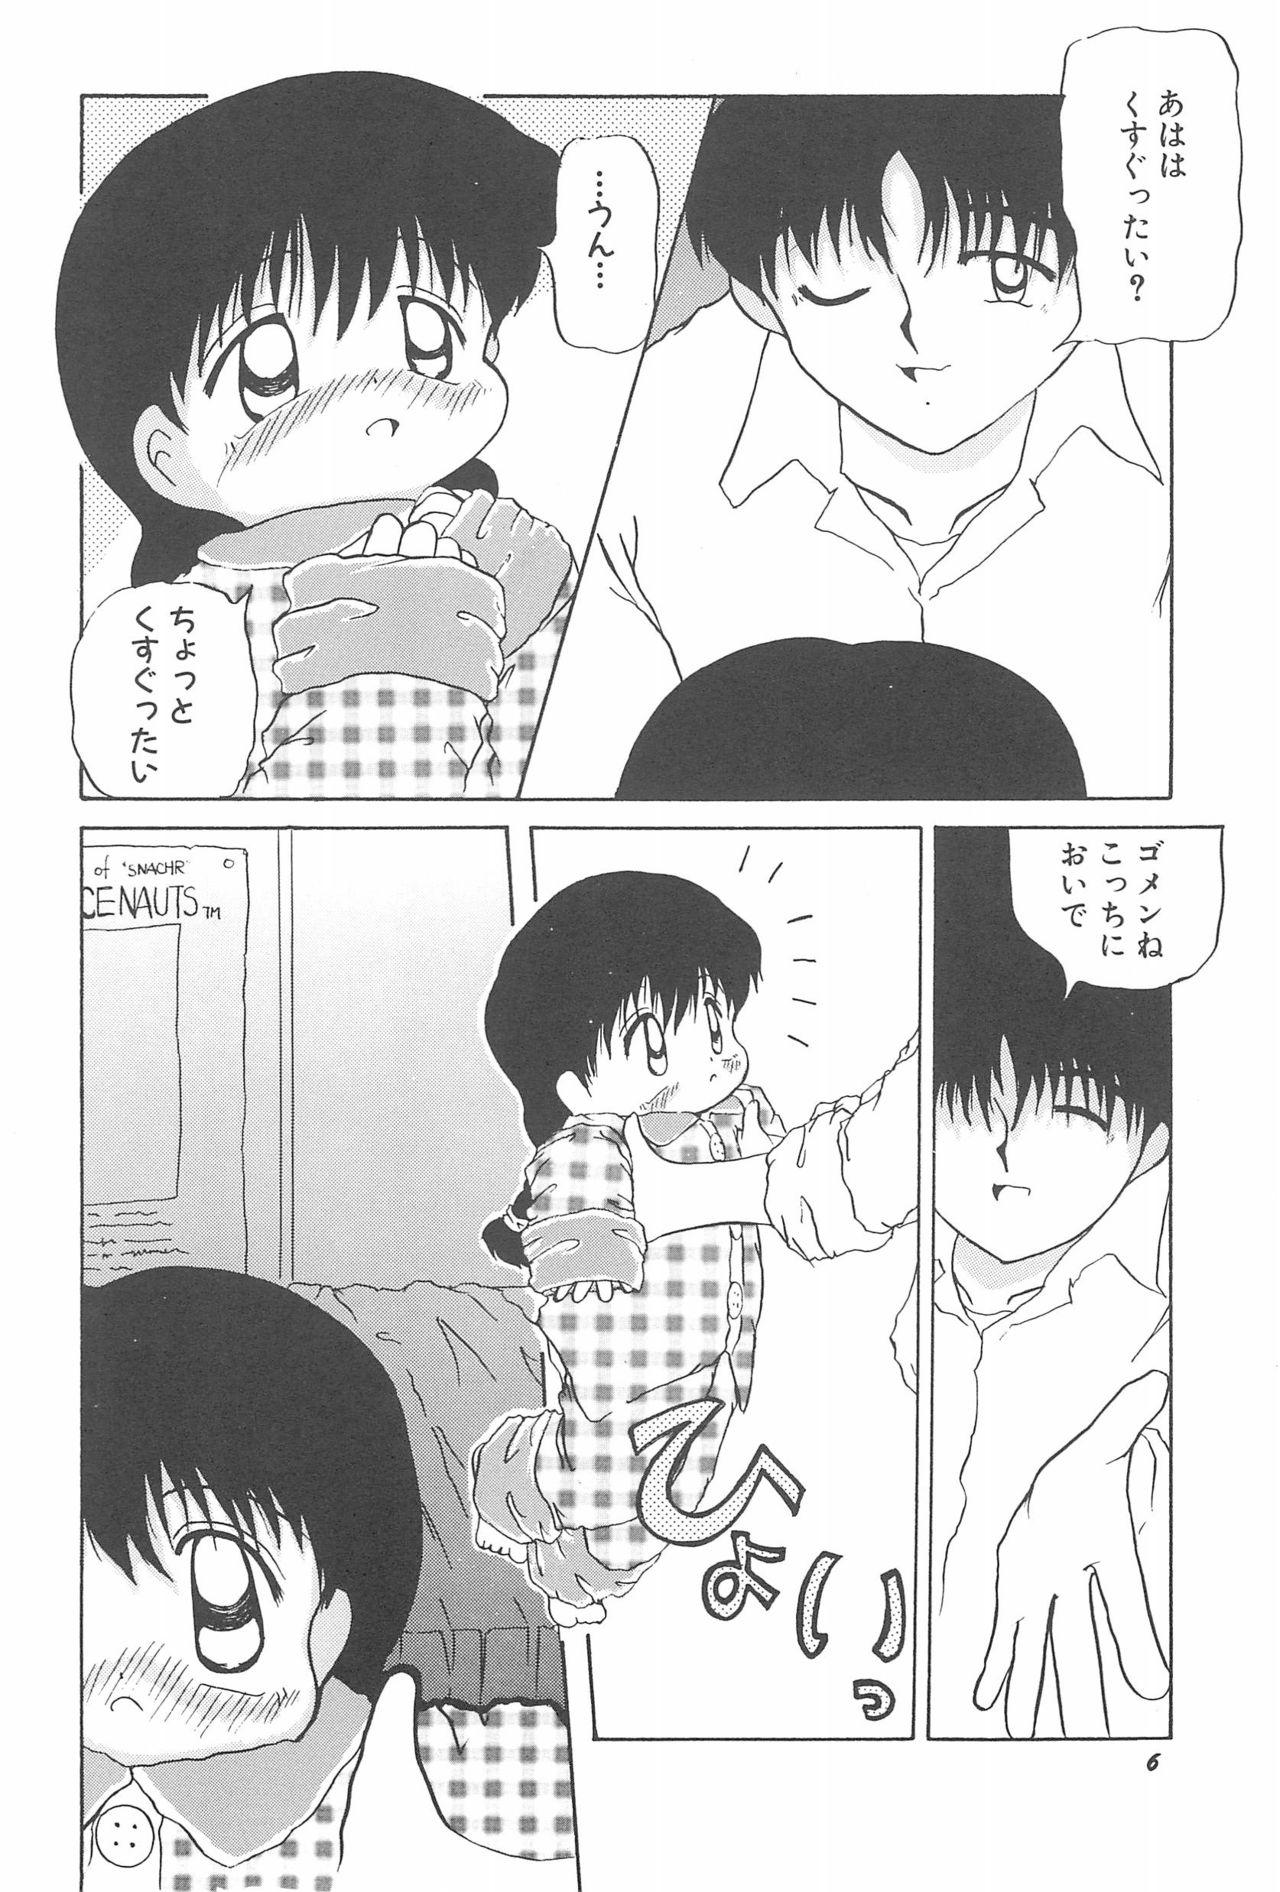 Aoi Shojokyuu 11